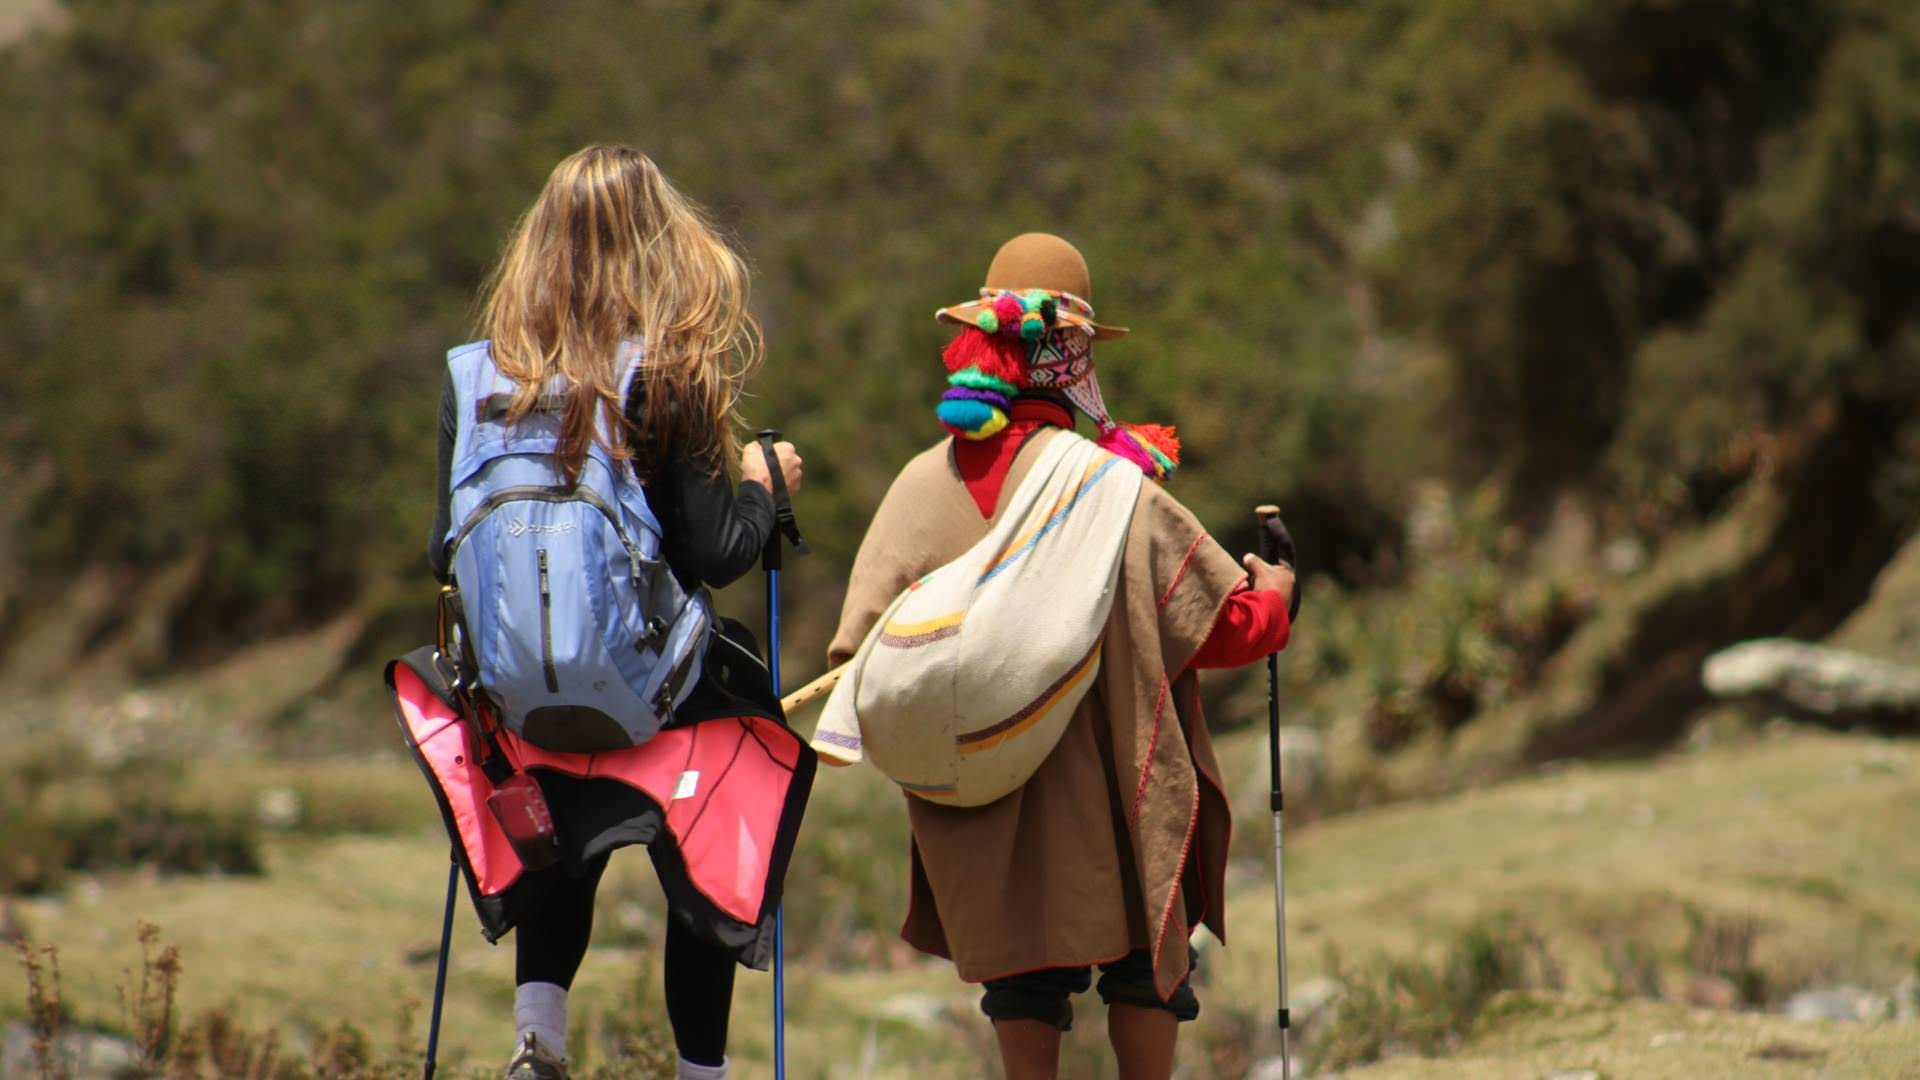 turista-con-paisana-caminando.jpg